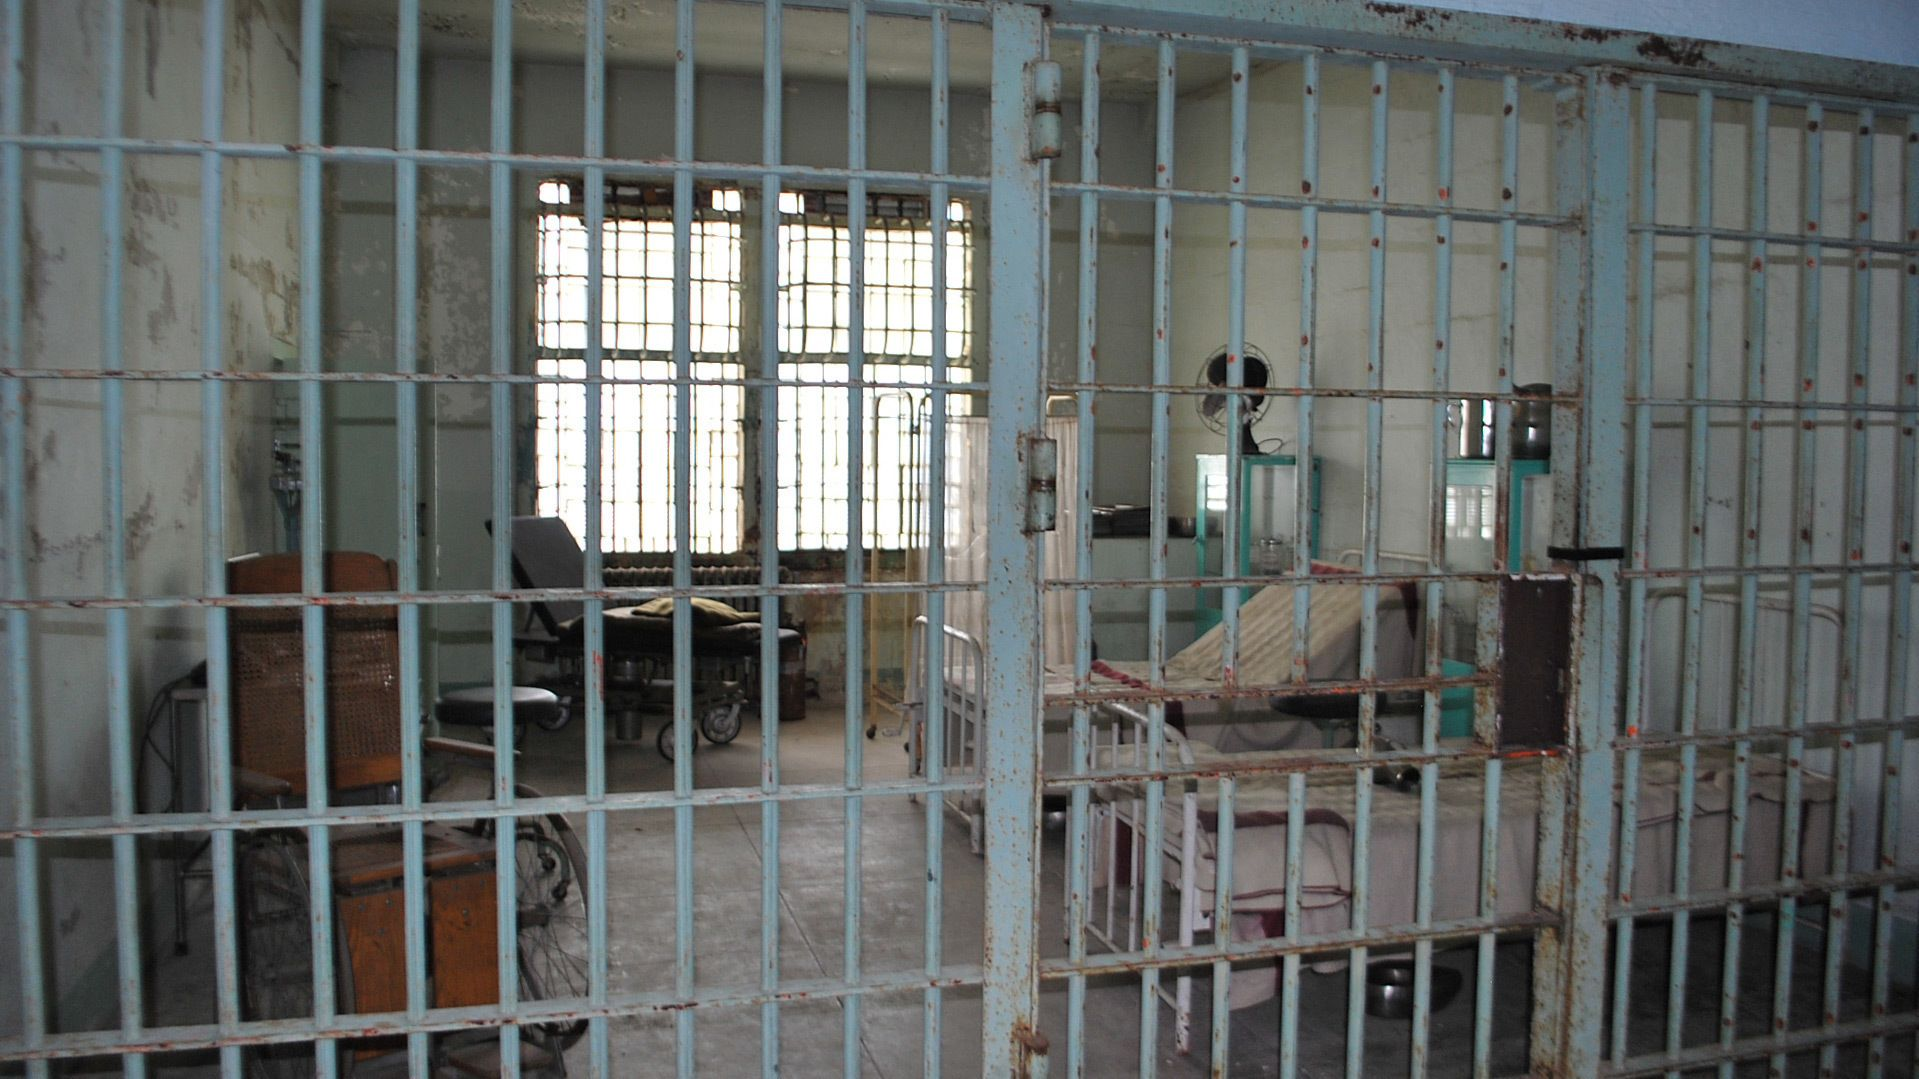 Cell inside Alcatraz in San Francisco